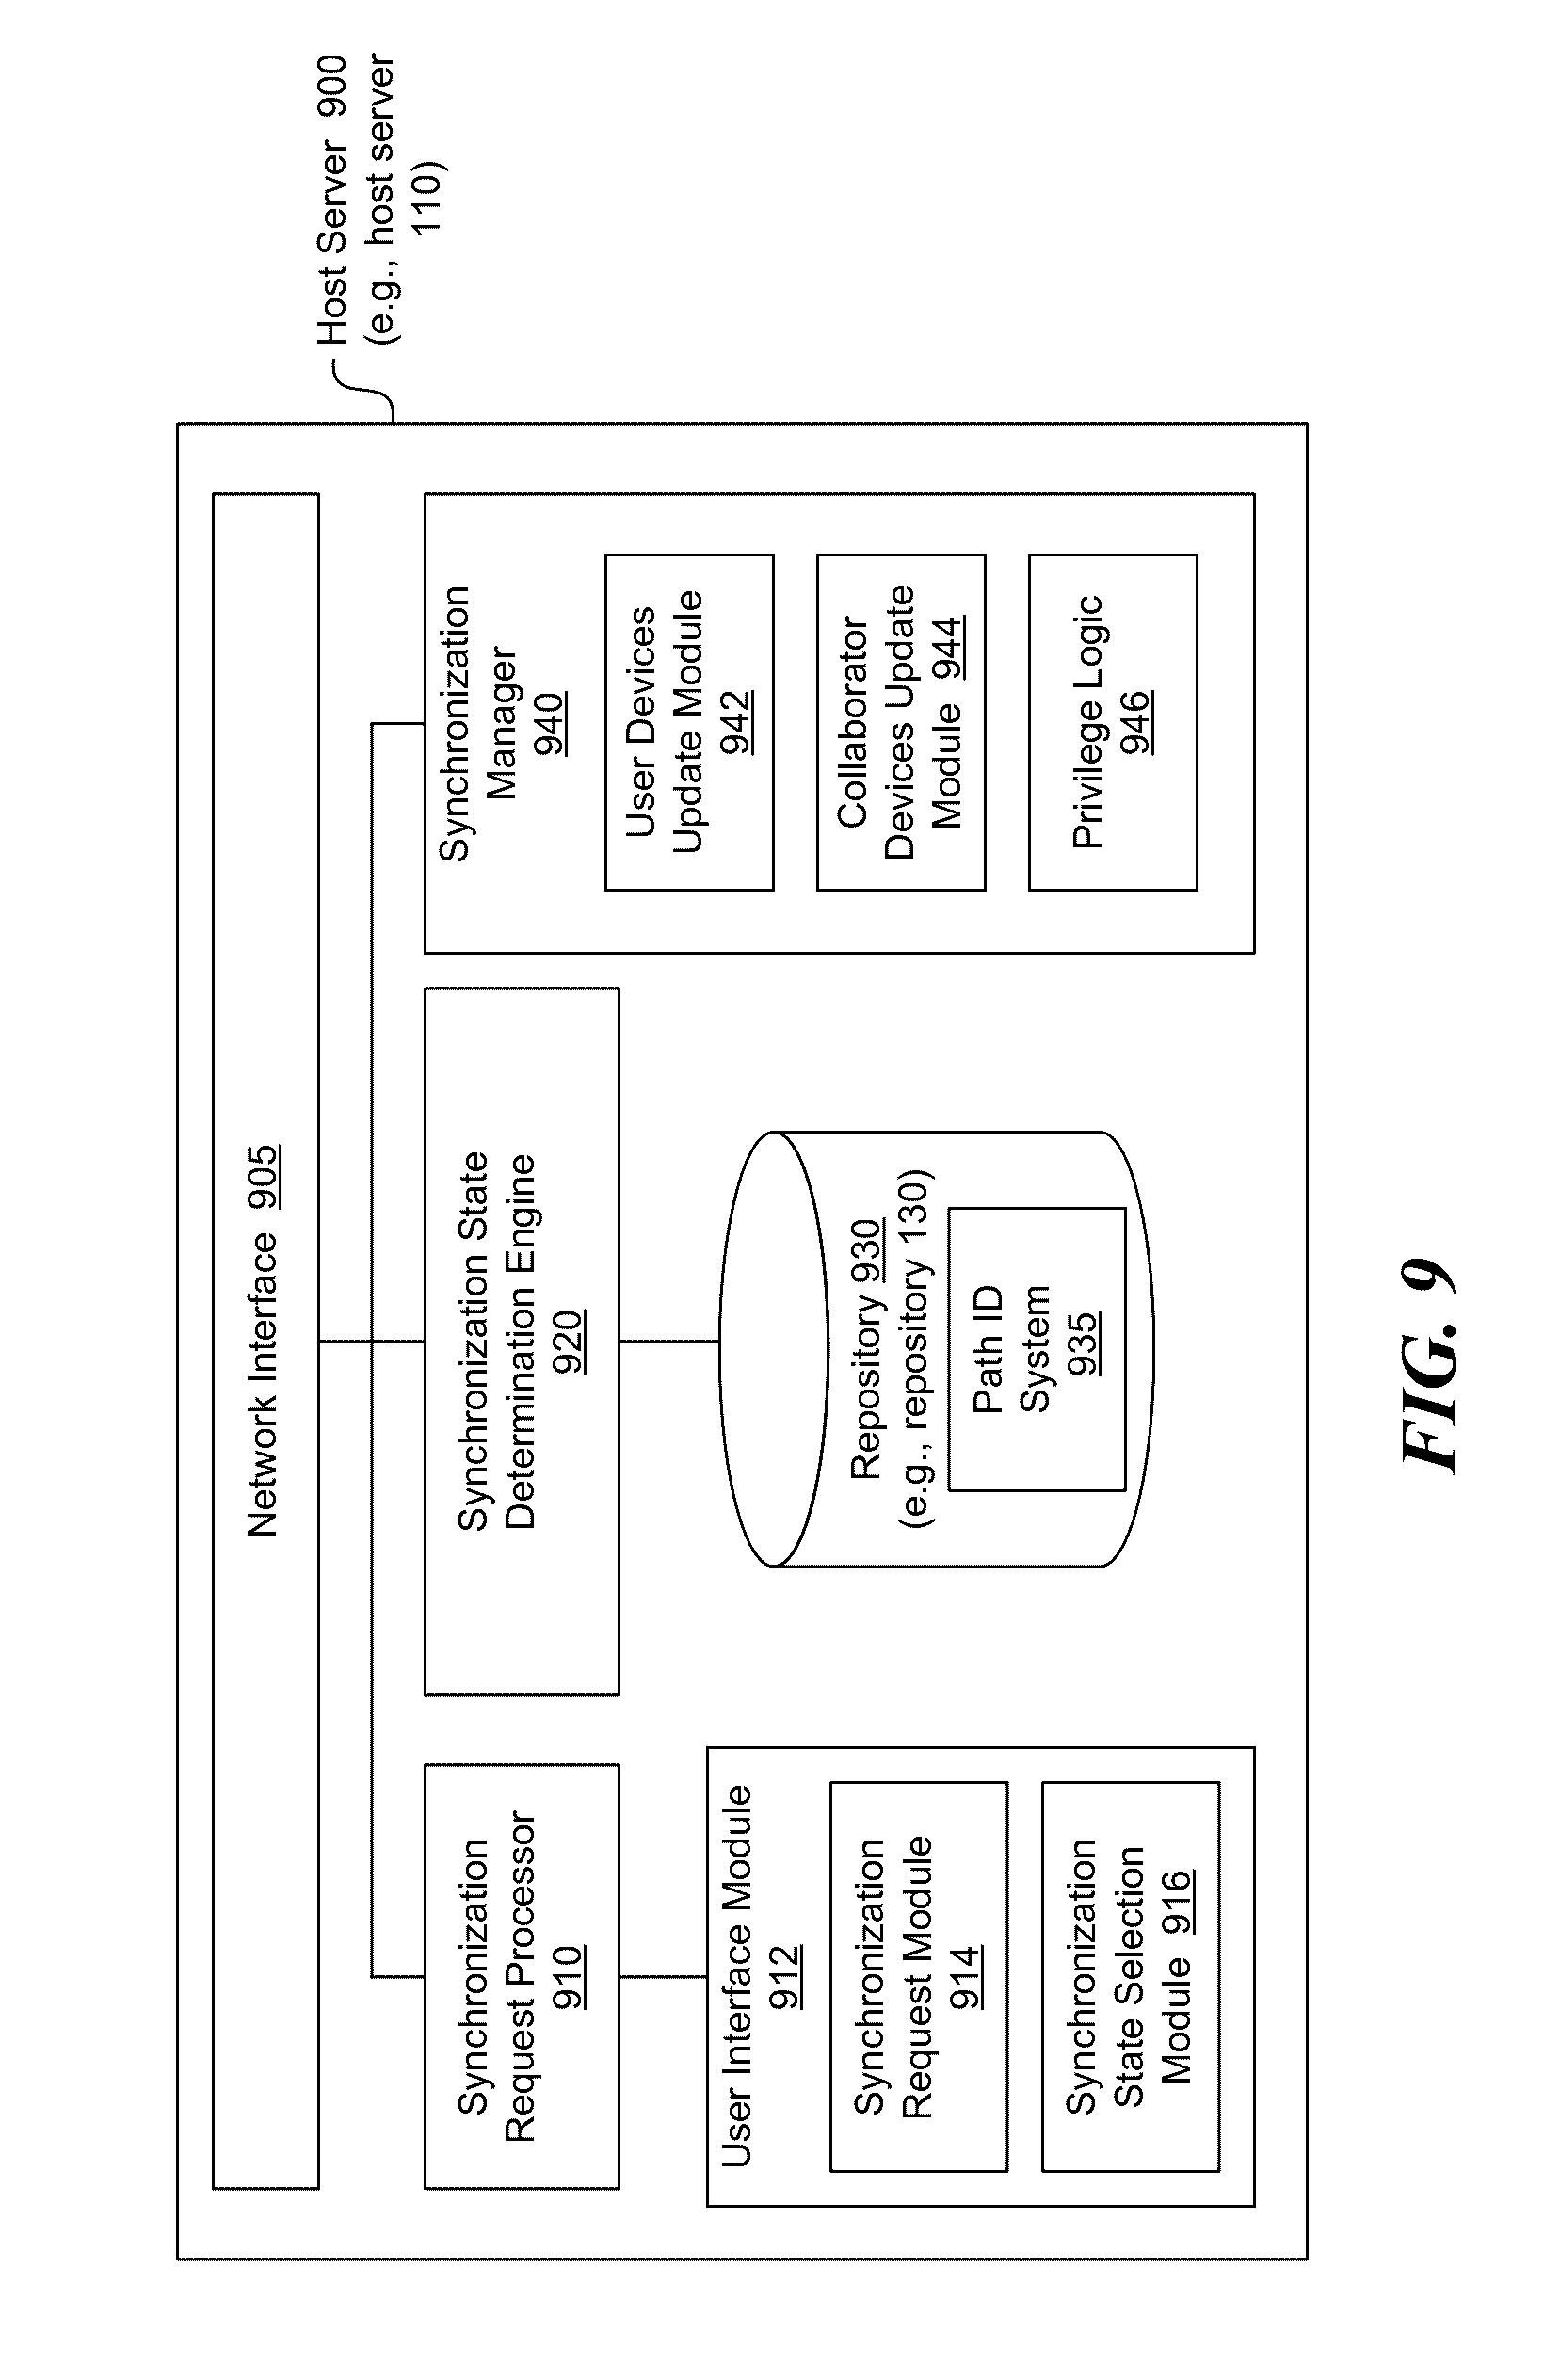 Patent US 9,558,202 B2